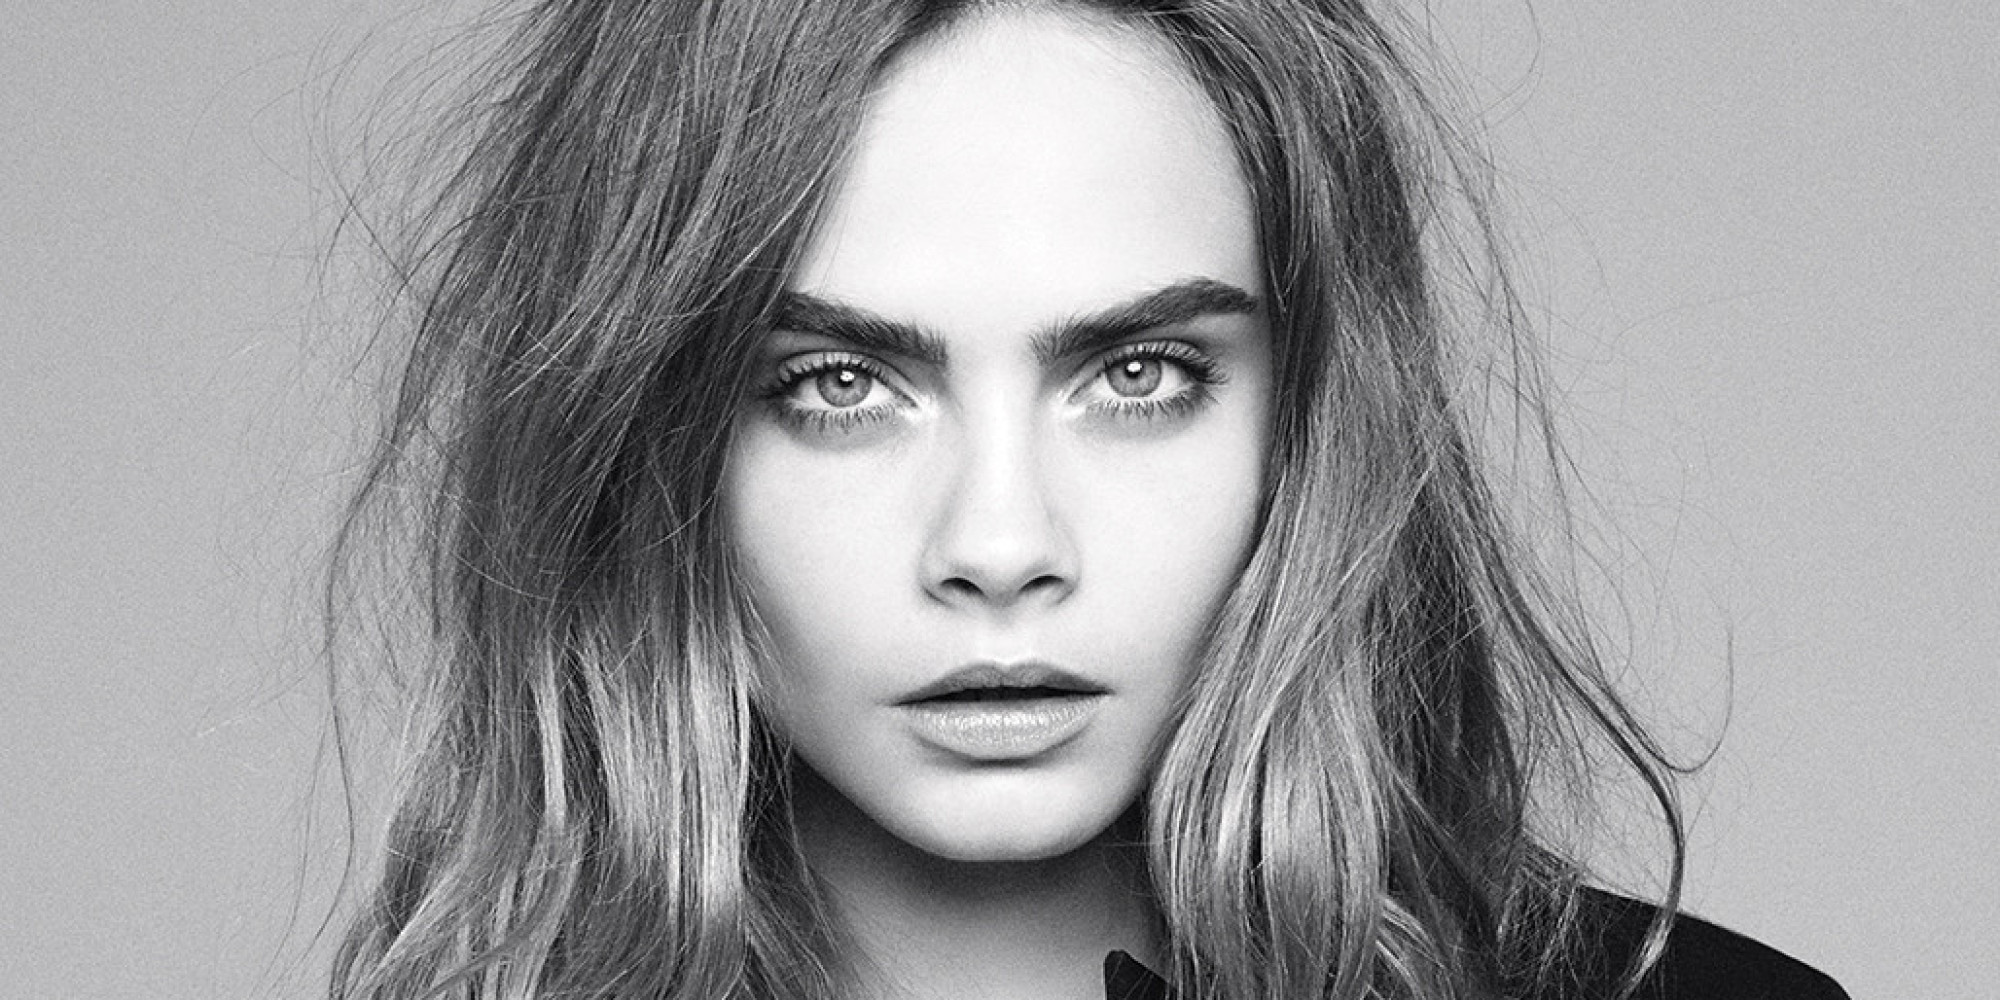 Cara Delevingne Chanel  Campaign